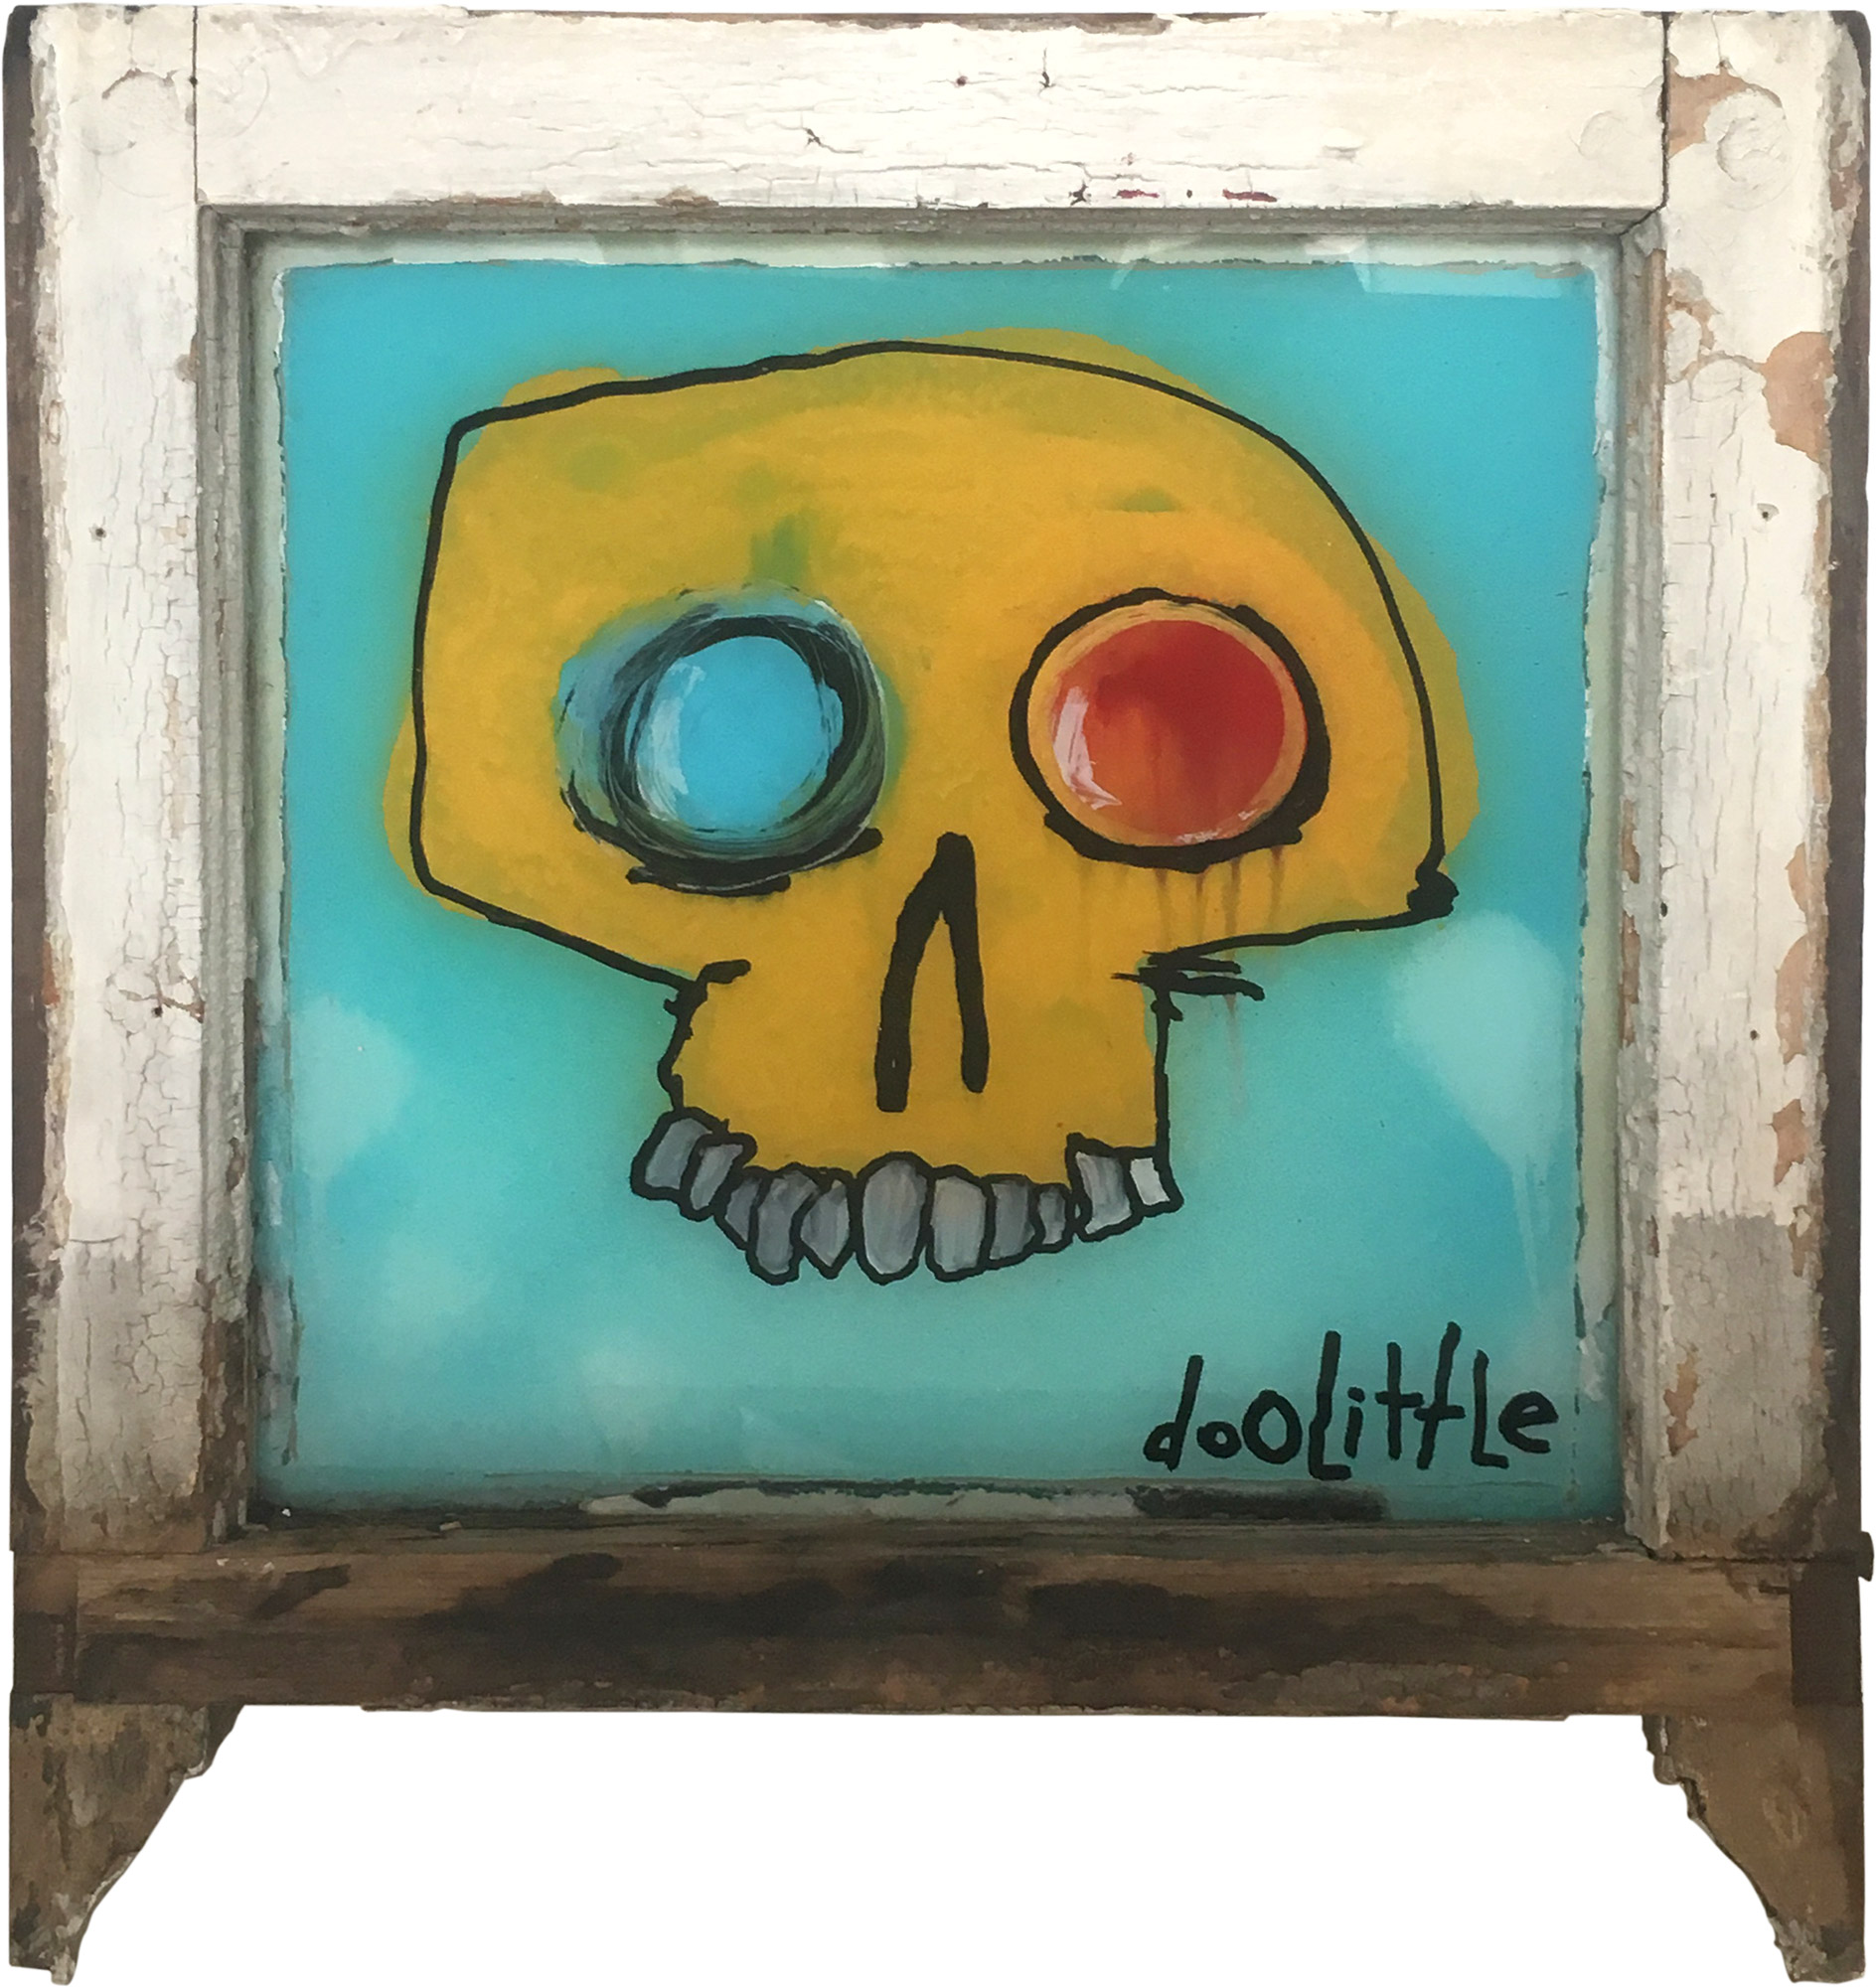 Doolittle Untitled